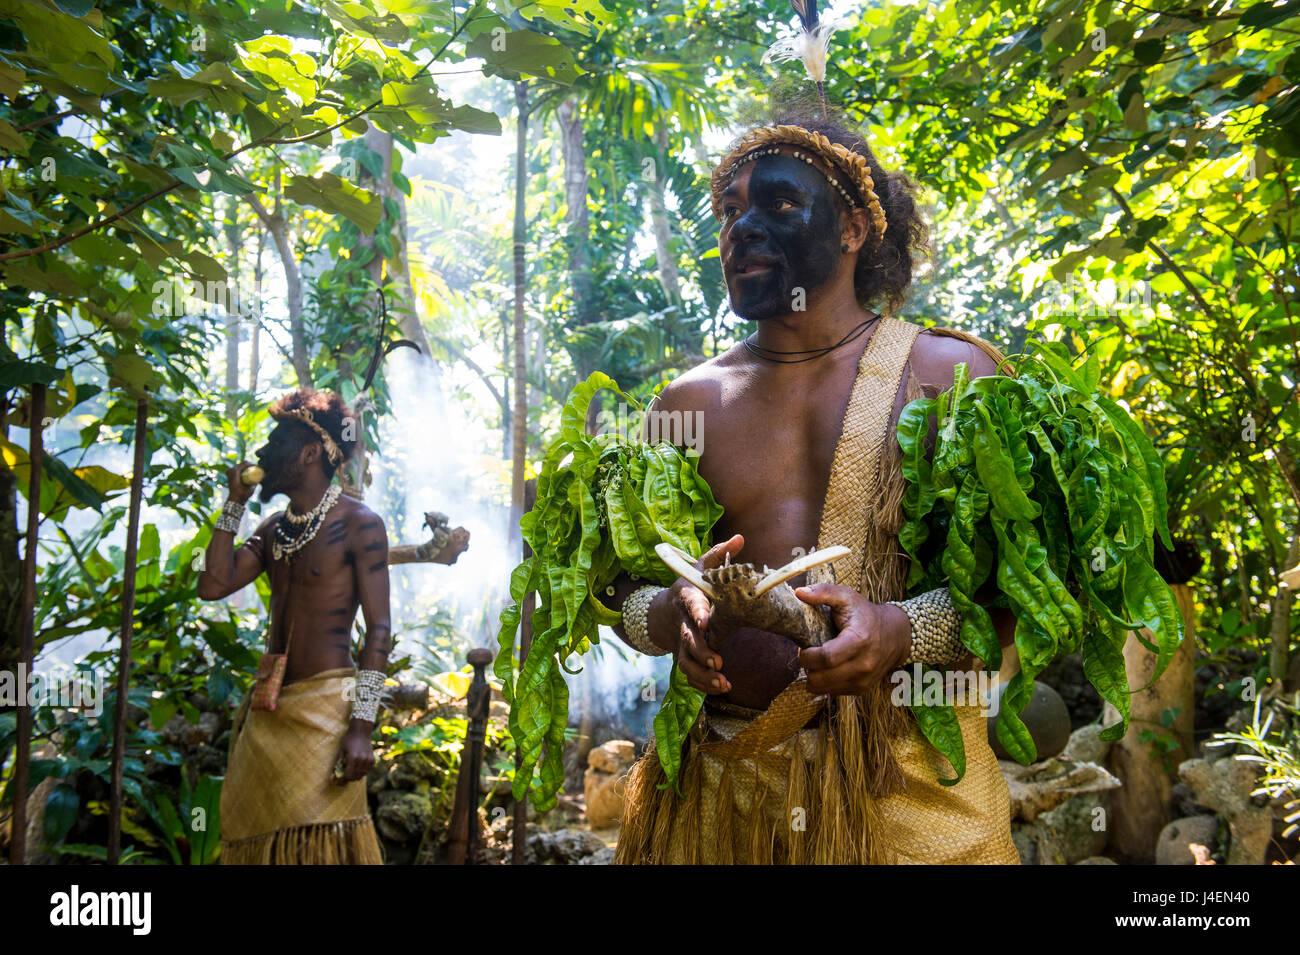 Traditional dressed man in the jungle, Ekasup Cultural Village, Efate, Vanuatu, Pacific - Stock Image